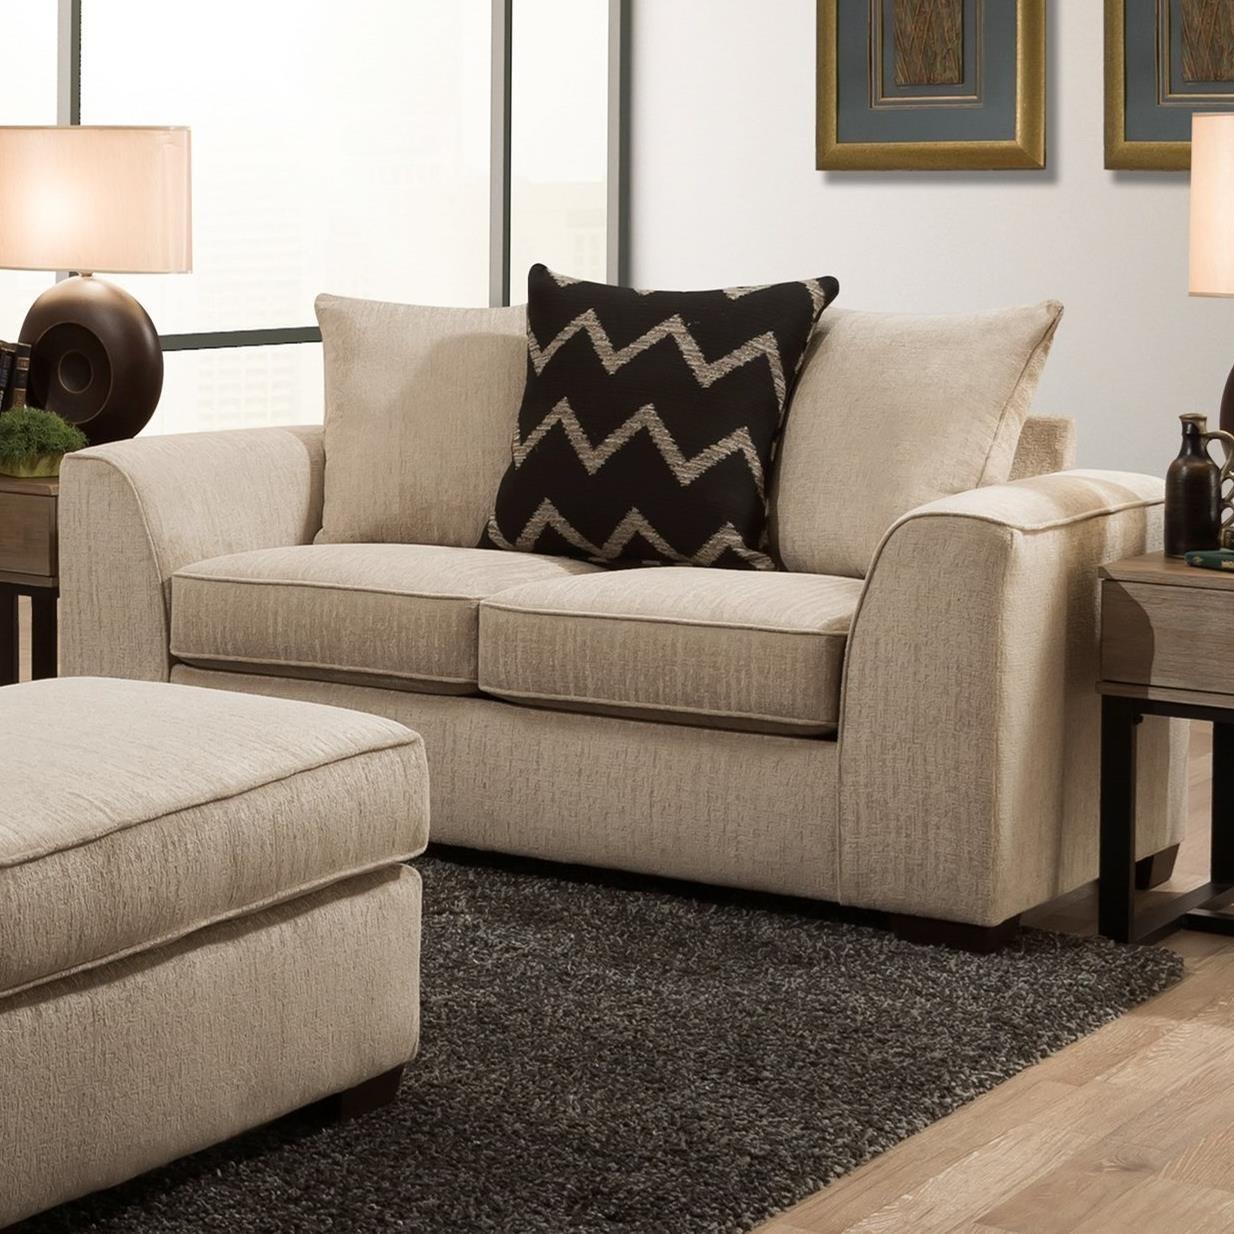 2600 Loveseat by Peak Living at Smart Buy Furniture